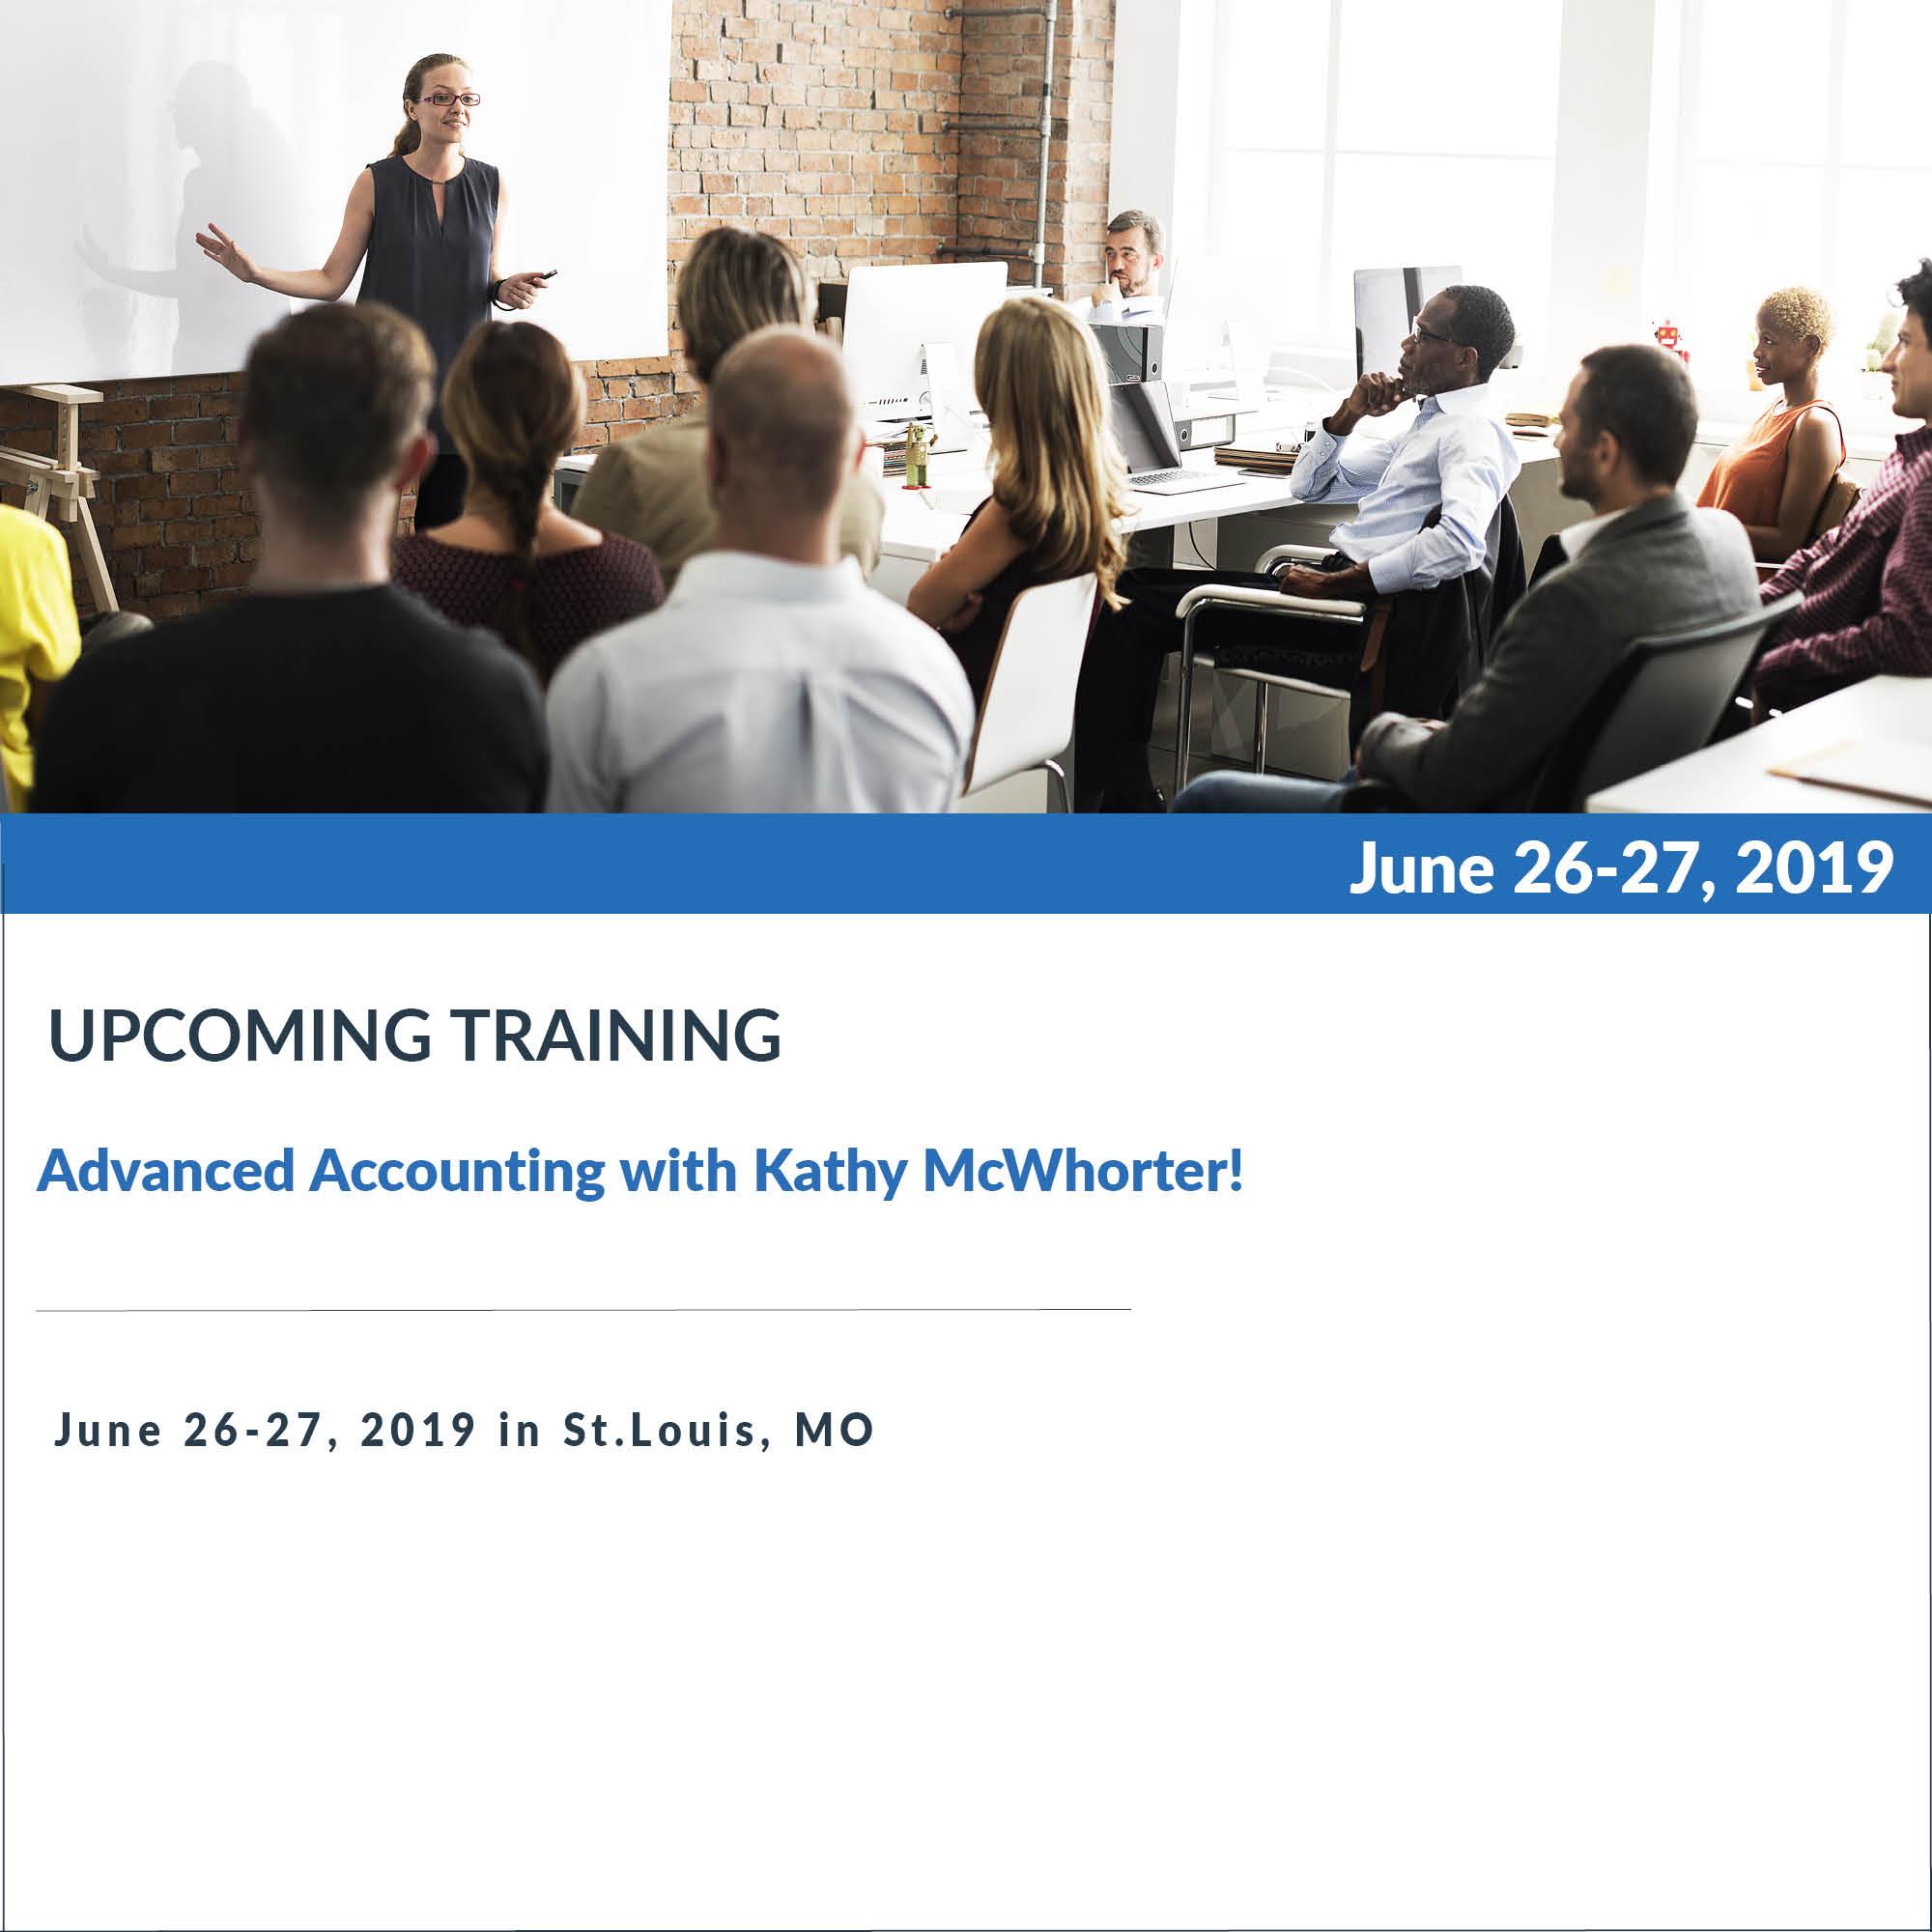 Aspire Training June 26-27, 2019